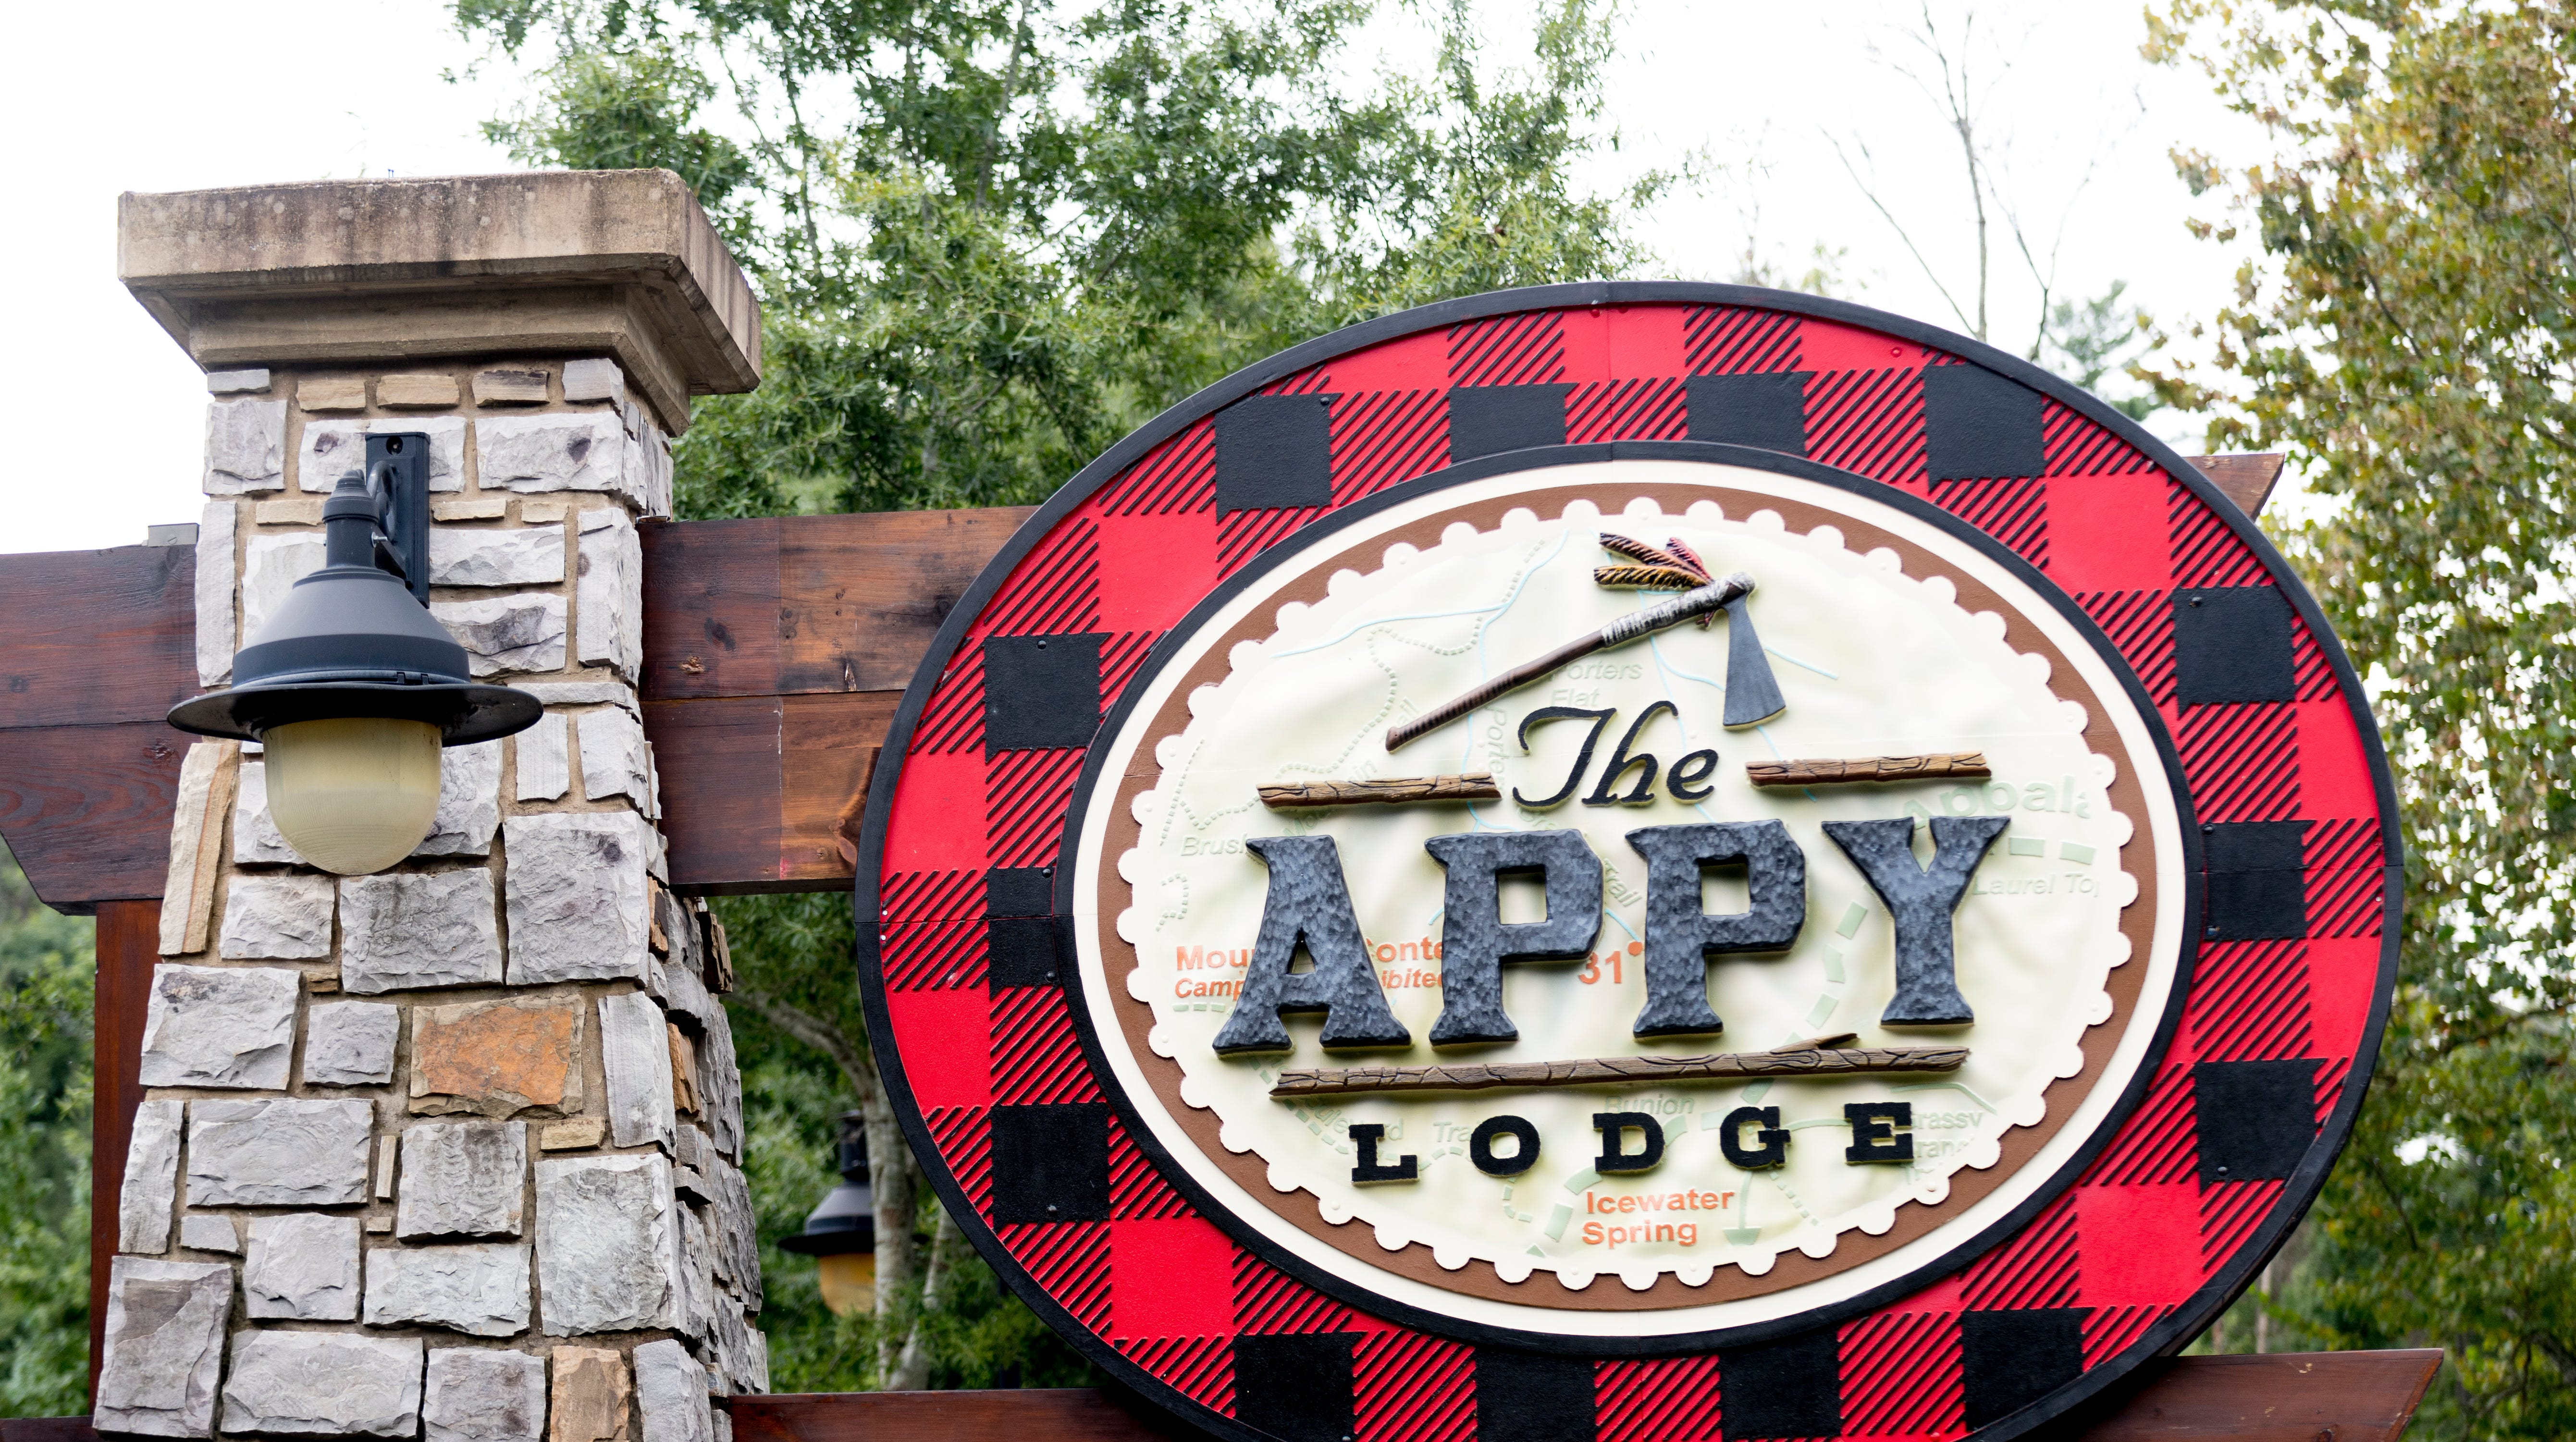 Gatlinburg's The Appy Lodge pays homage to Appalachian Trail